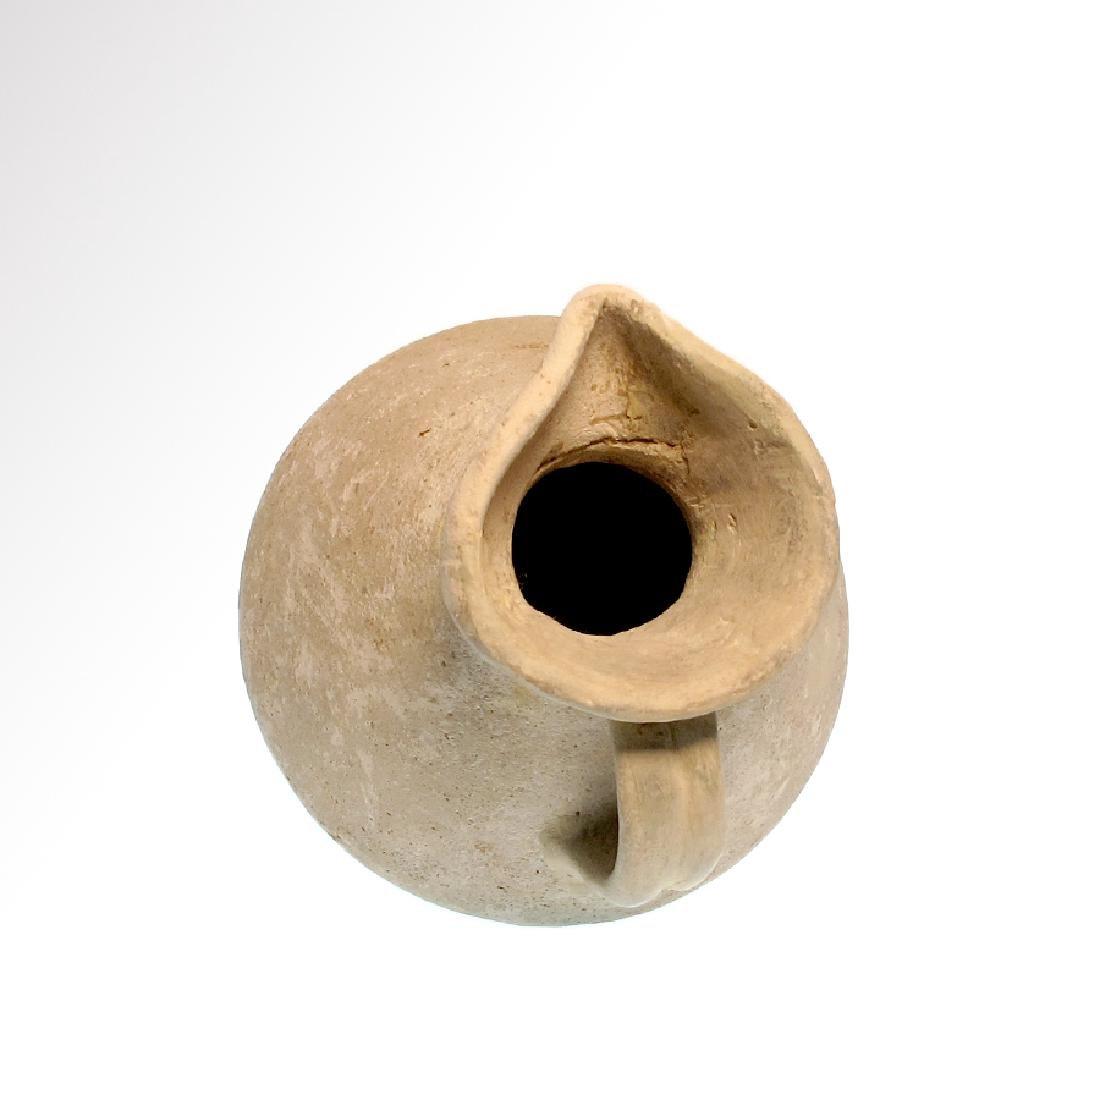 Roman Terracotta Jug, Trefoil lip, c. 1st Century A.D. - 5